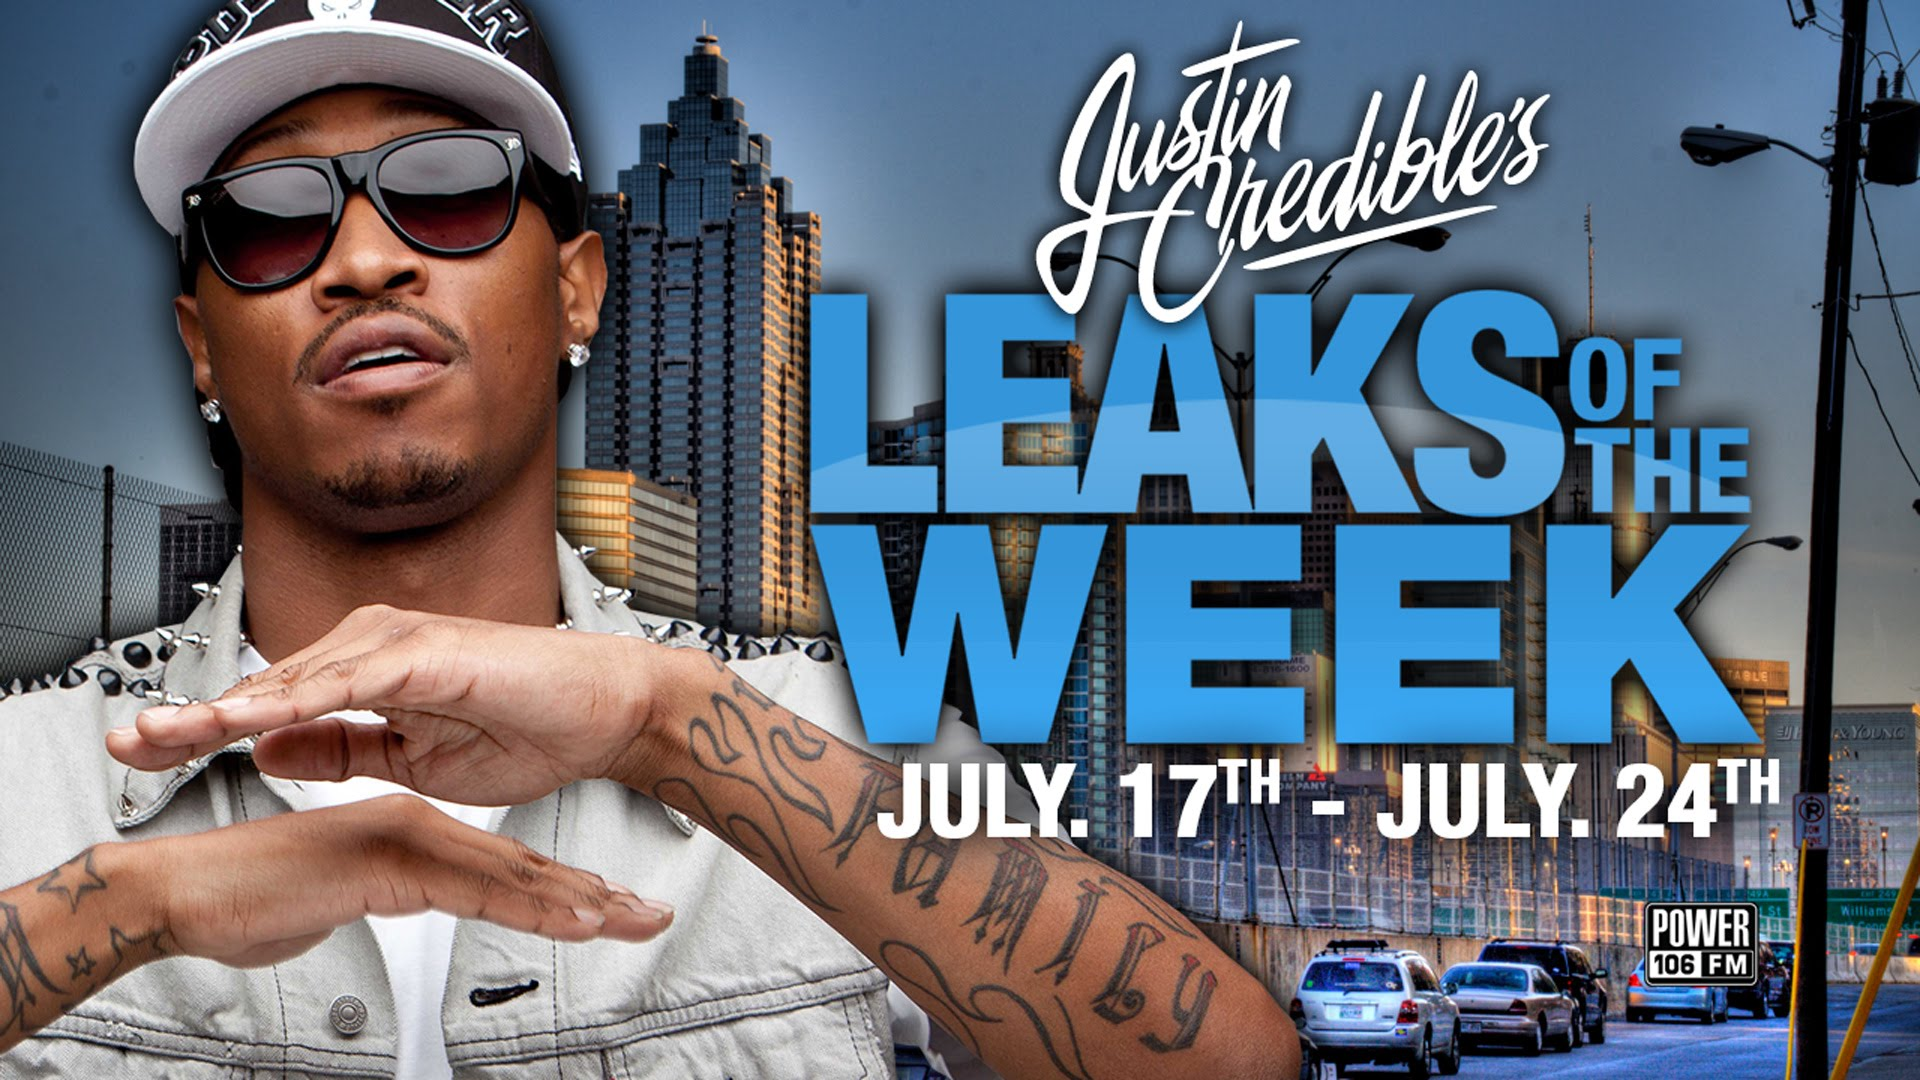 Justin Credible's #LeaksOfTheWeek w/ Future, Majid Jordan, & Hit-Boy (Video)